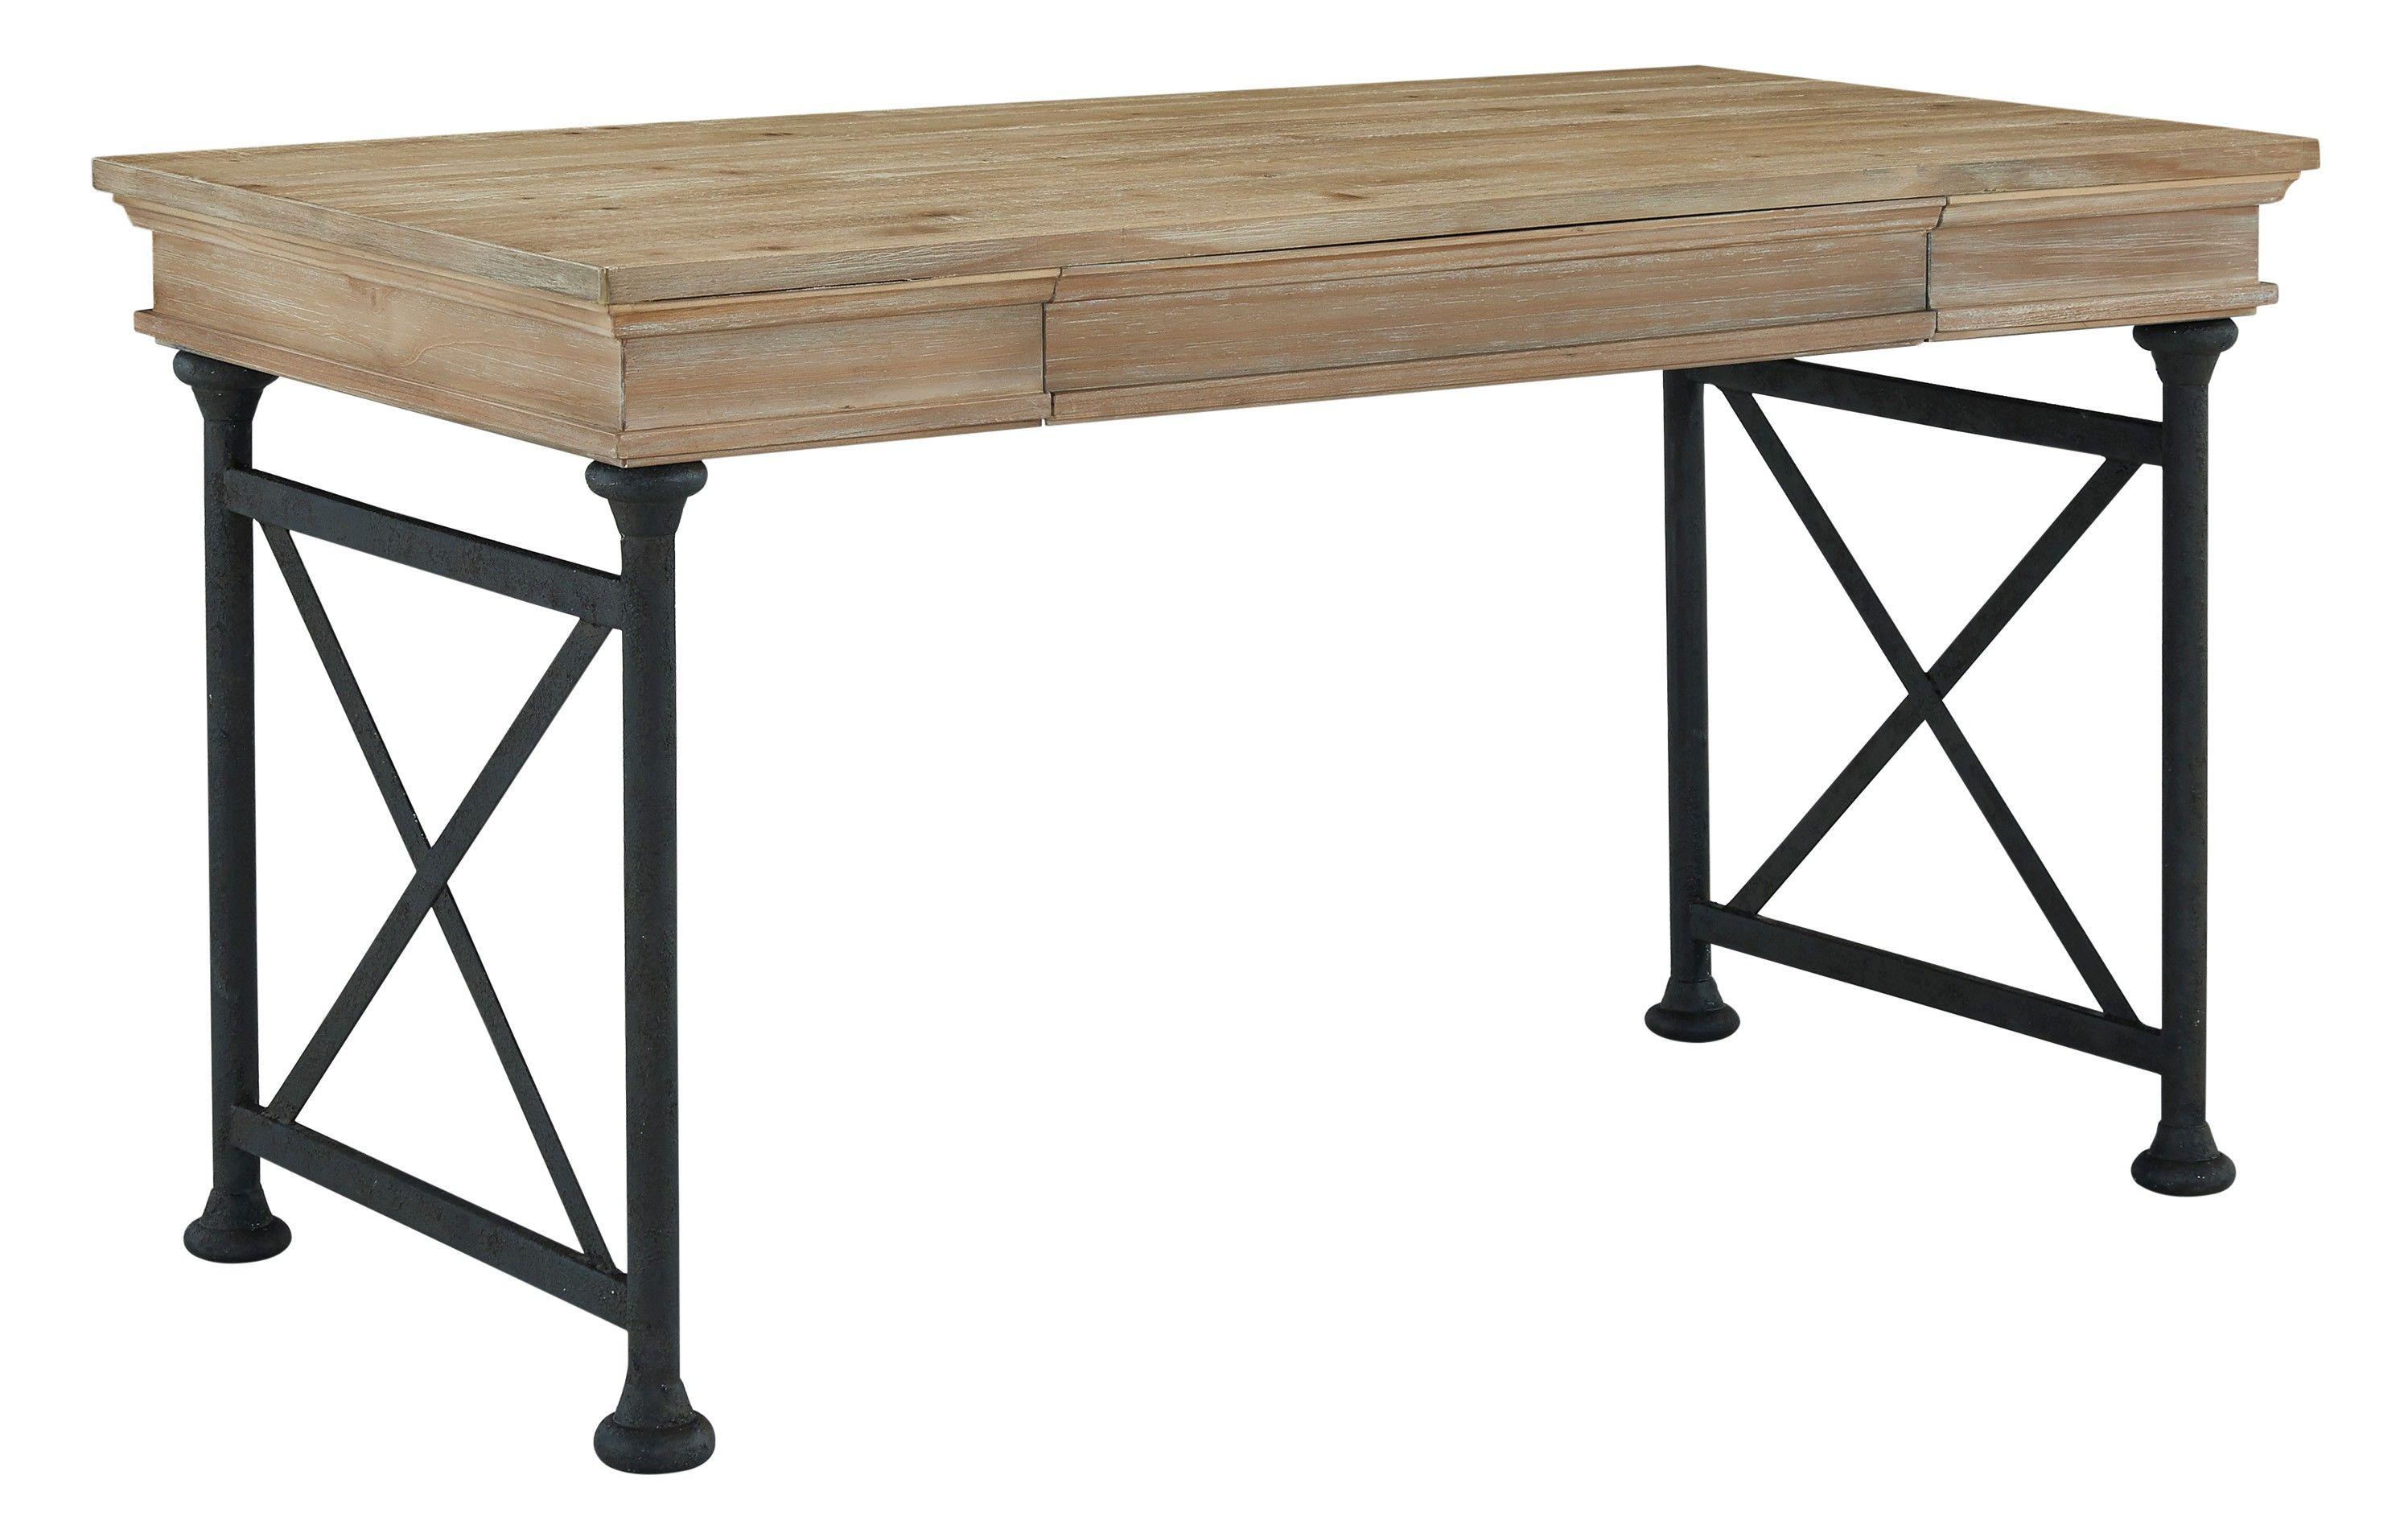 Ashley Shennifin H862-44 Signature Design Home Office Large Leg Desk ...